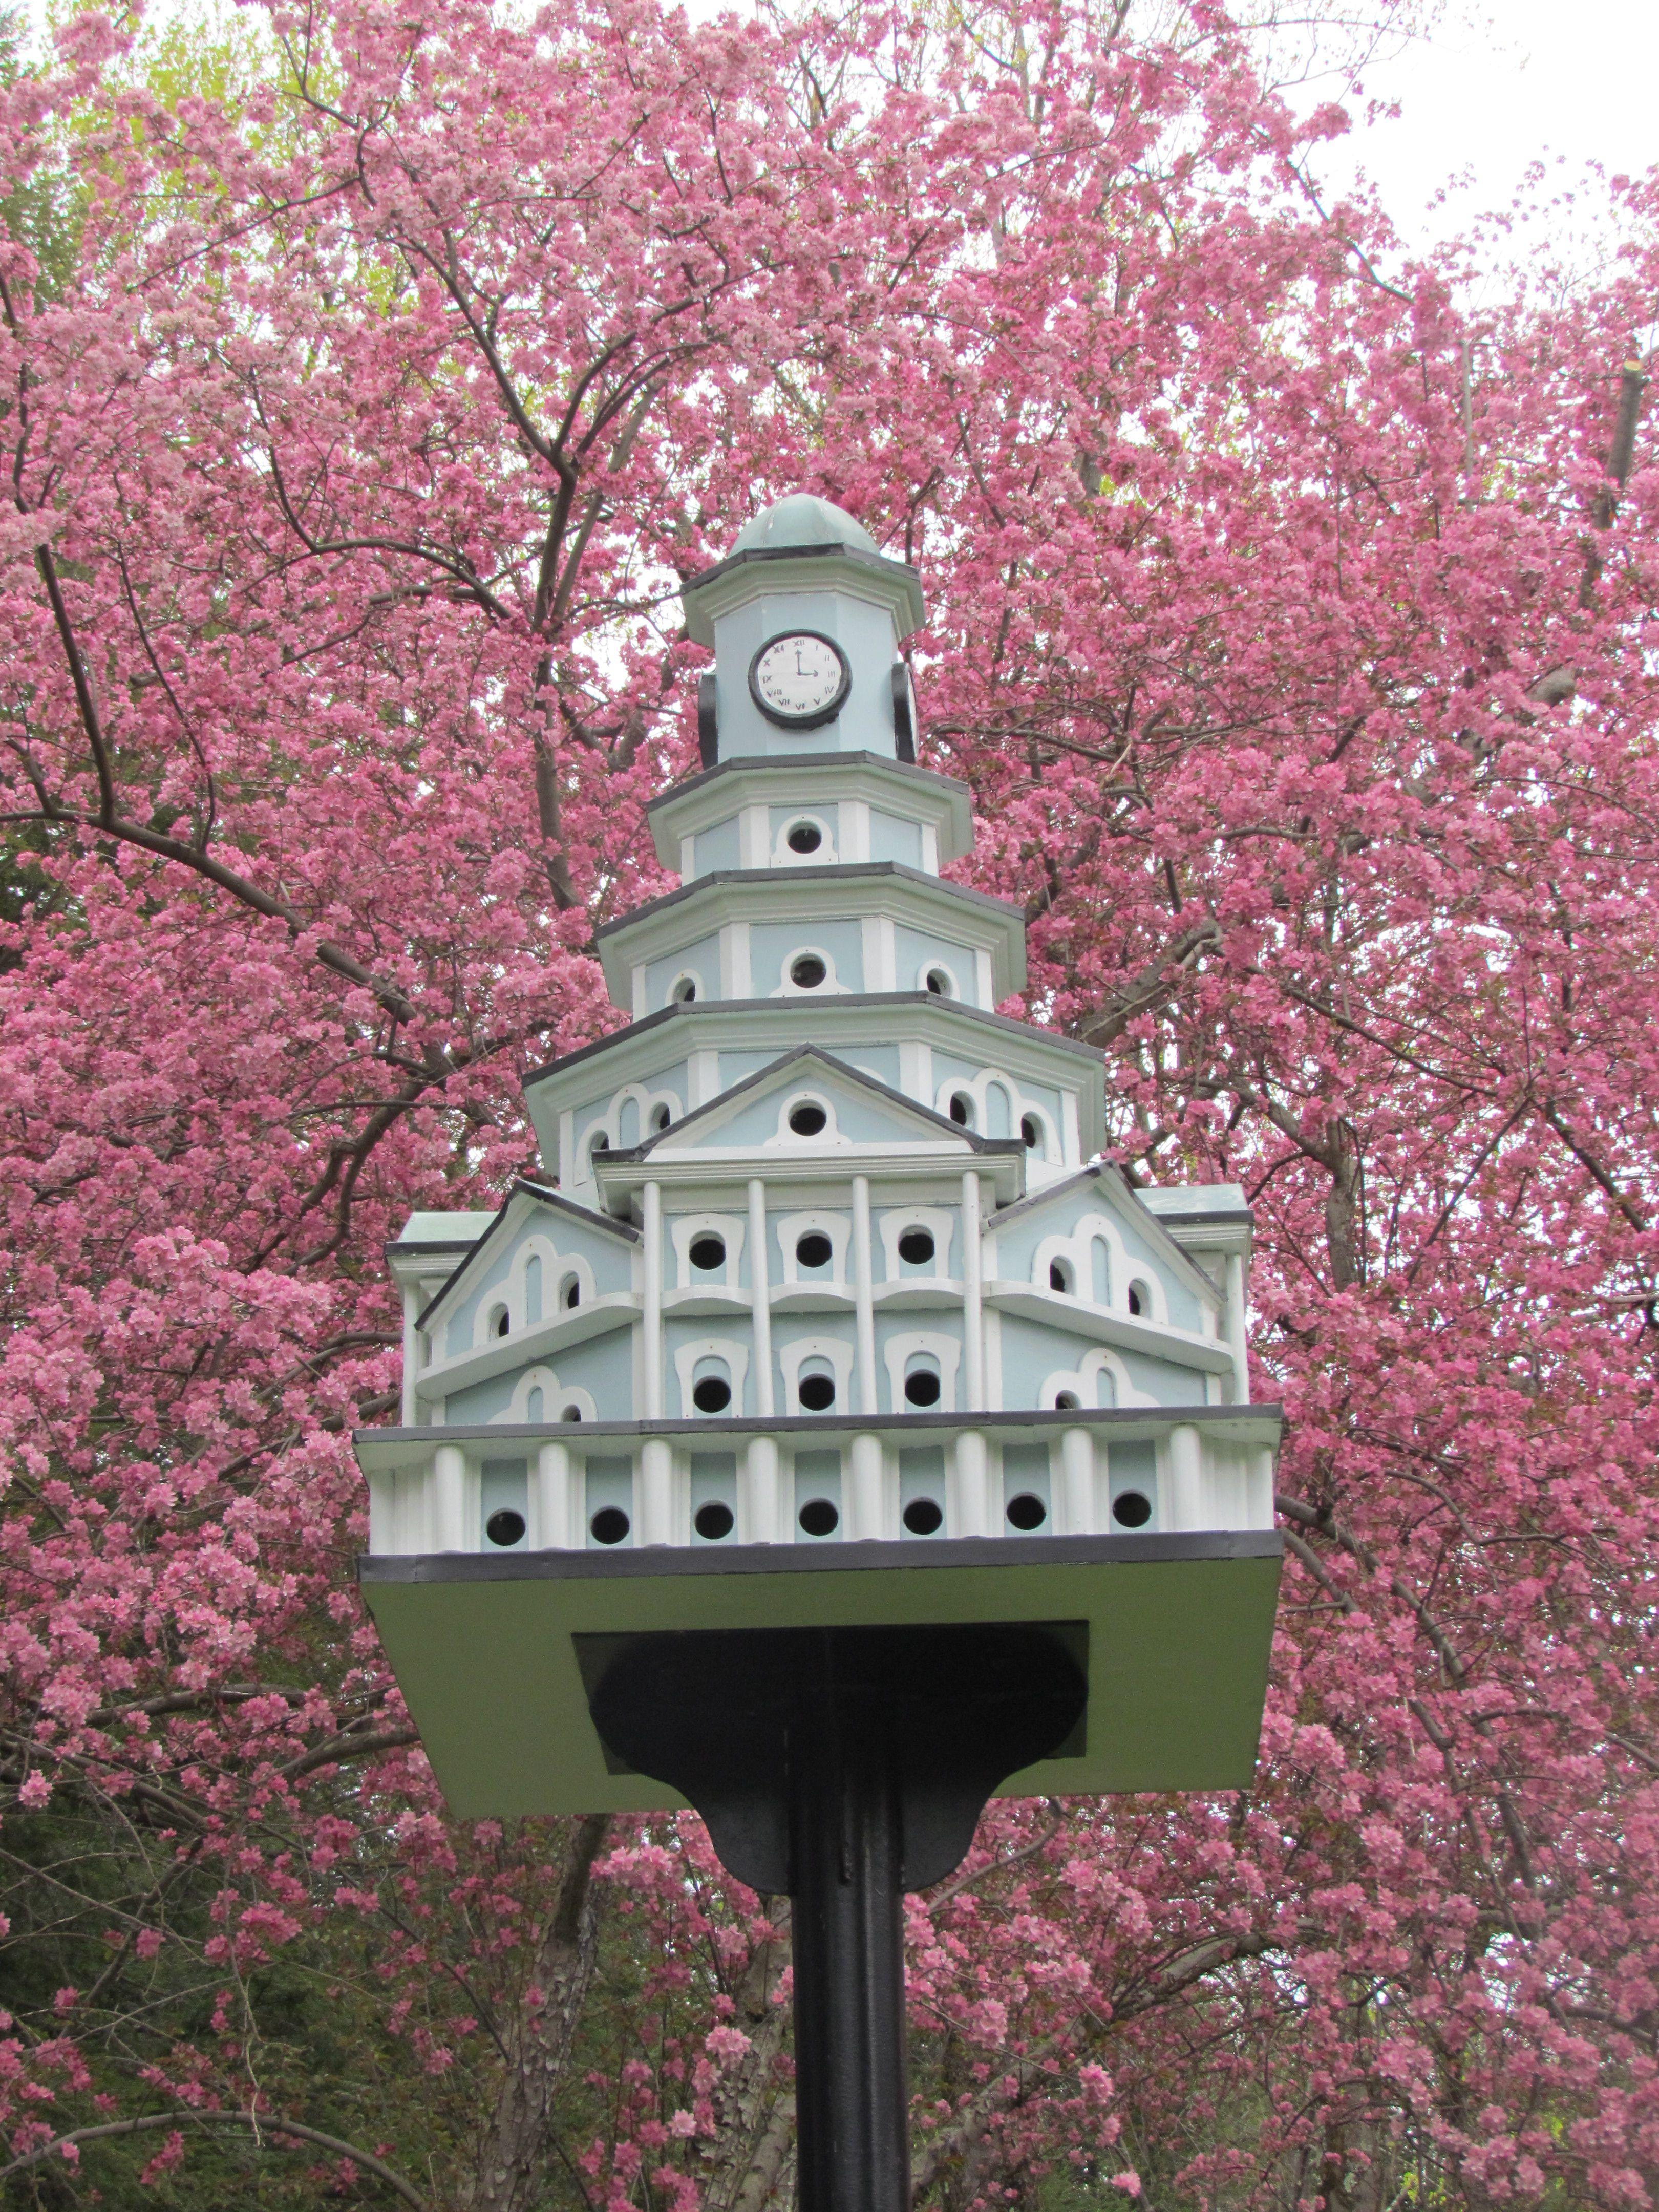 Kentuck Knob/Hagan House / 723 Kentuck Road, Chalk Hill, PA / 1953-56 / Usonian / Frank Lloyd Wright -- Notice the clocks on this birdhouse